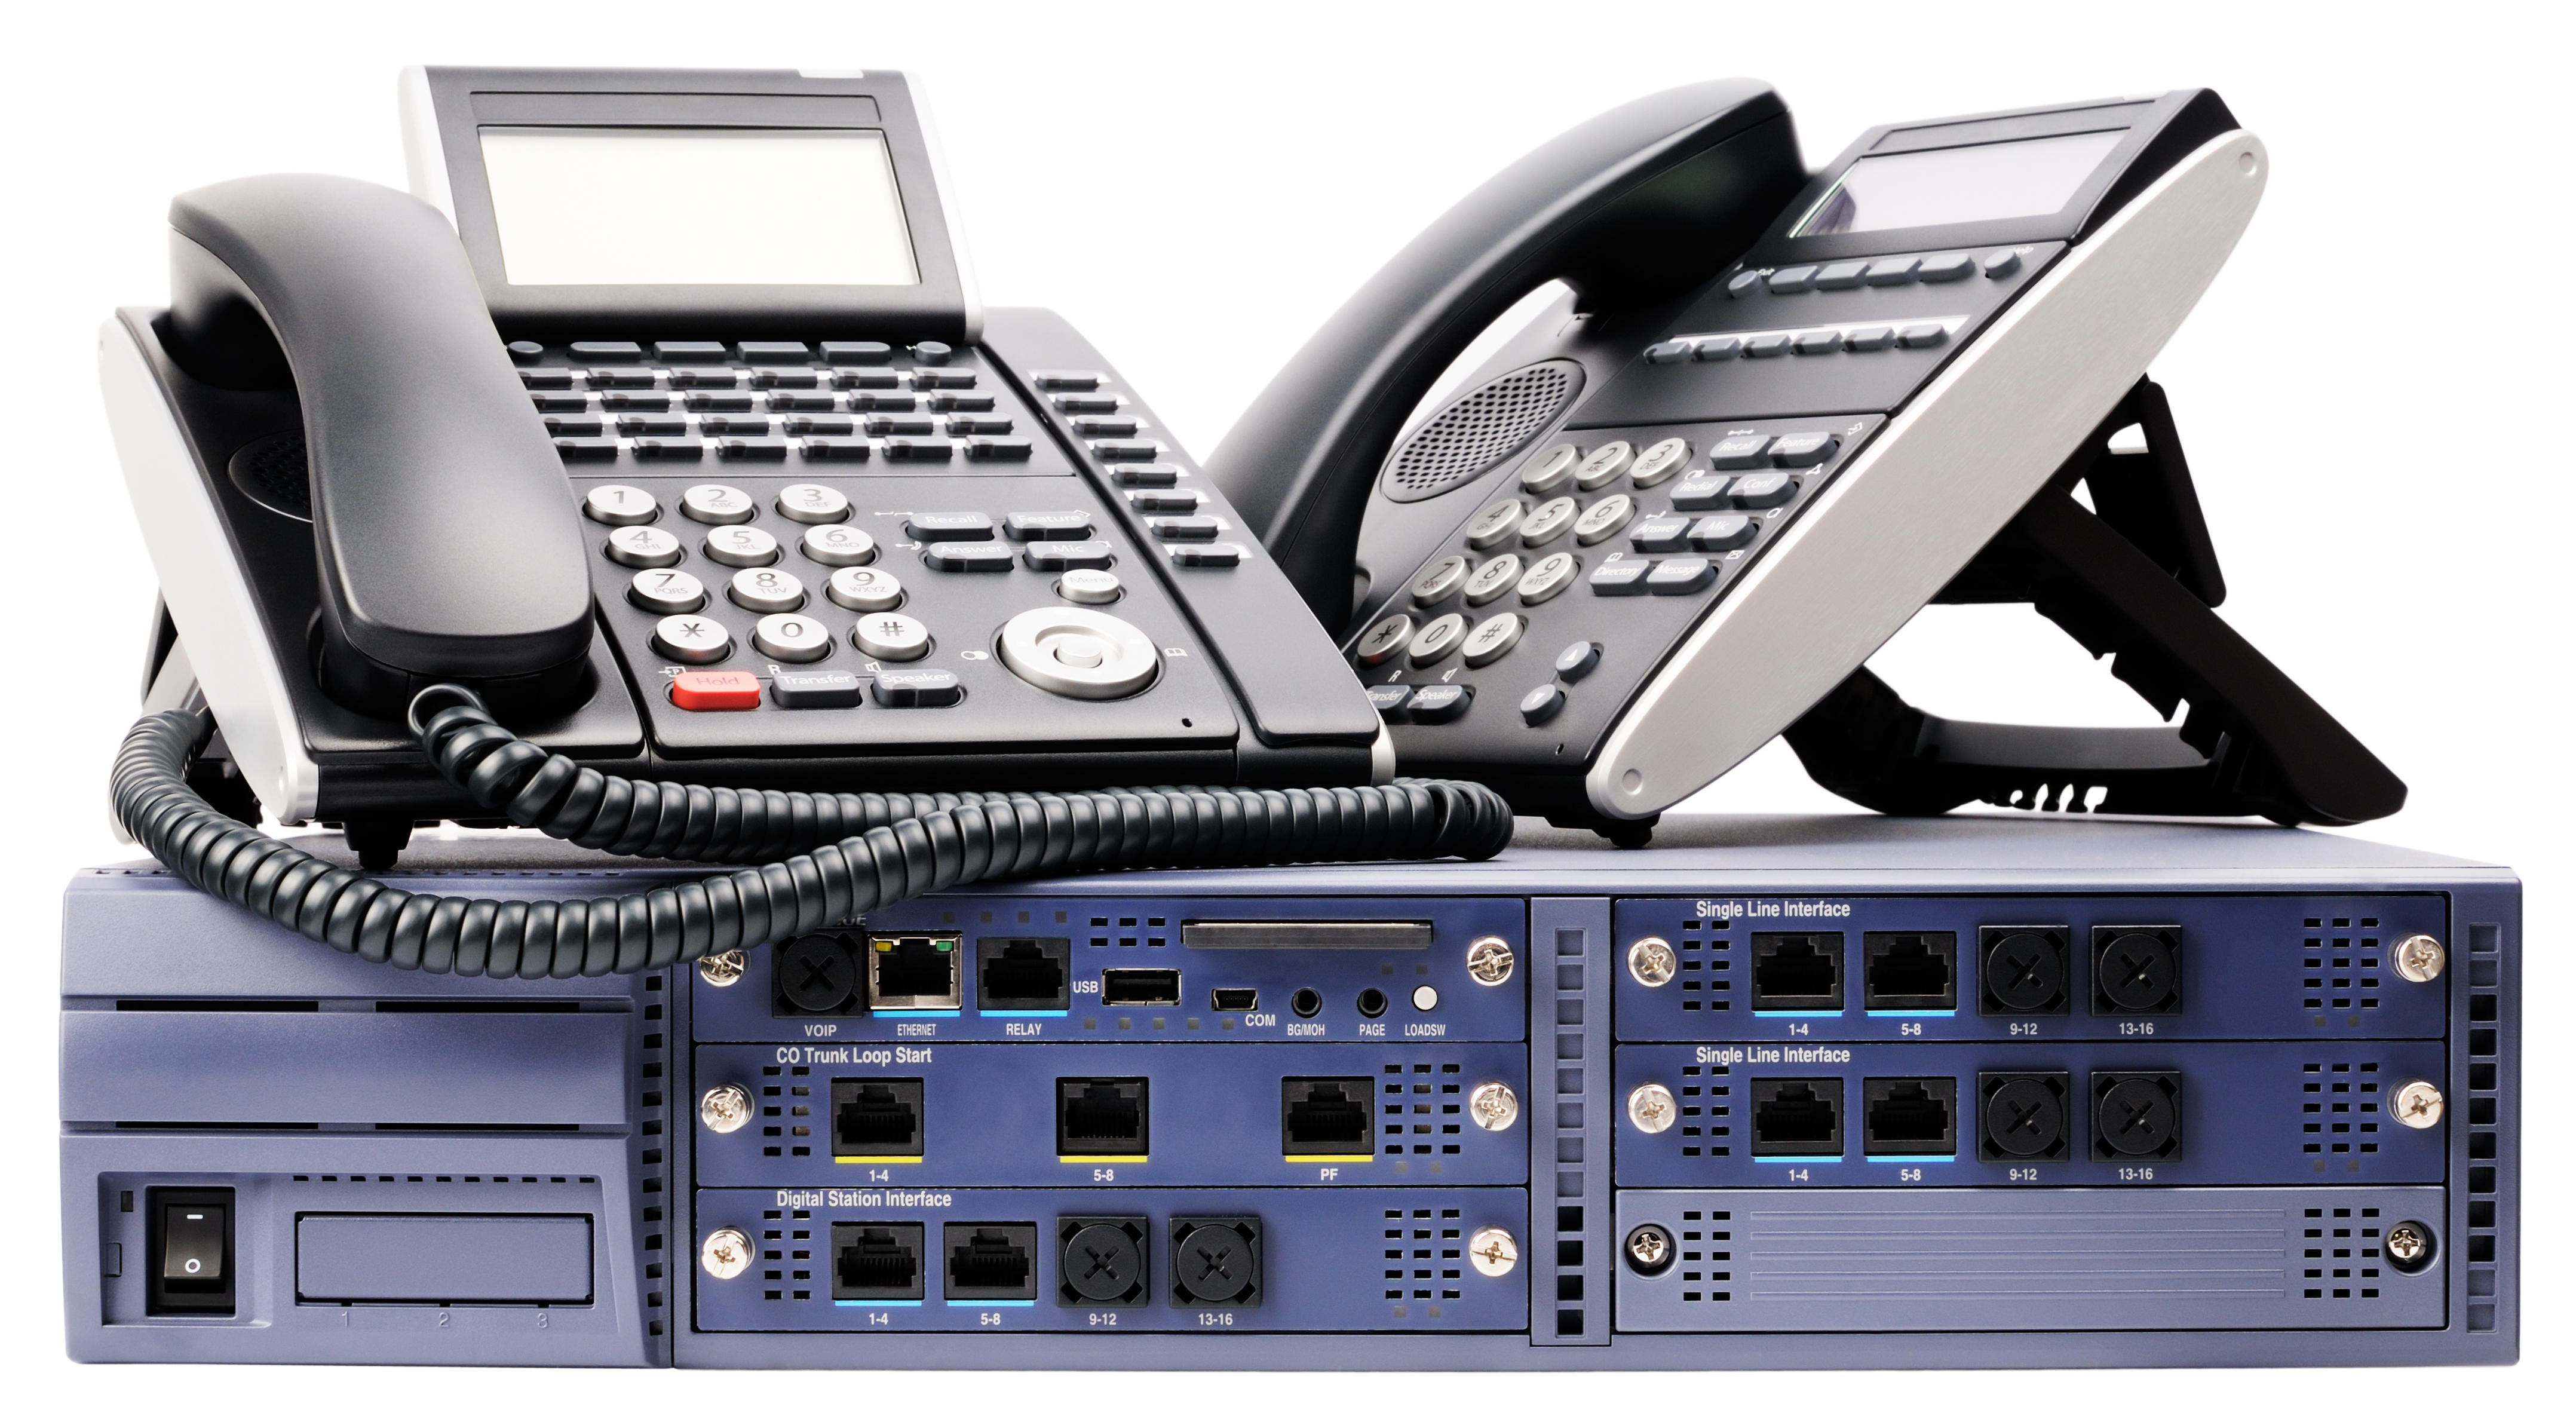 San Tan Communications LLC image 2